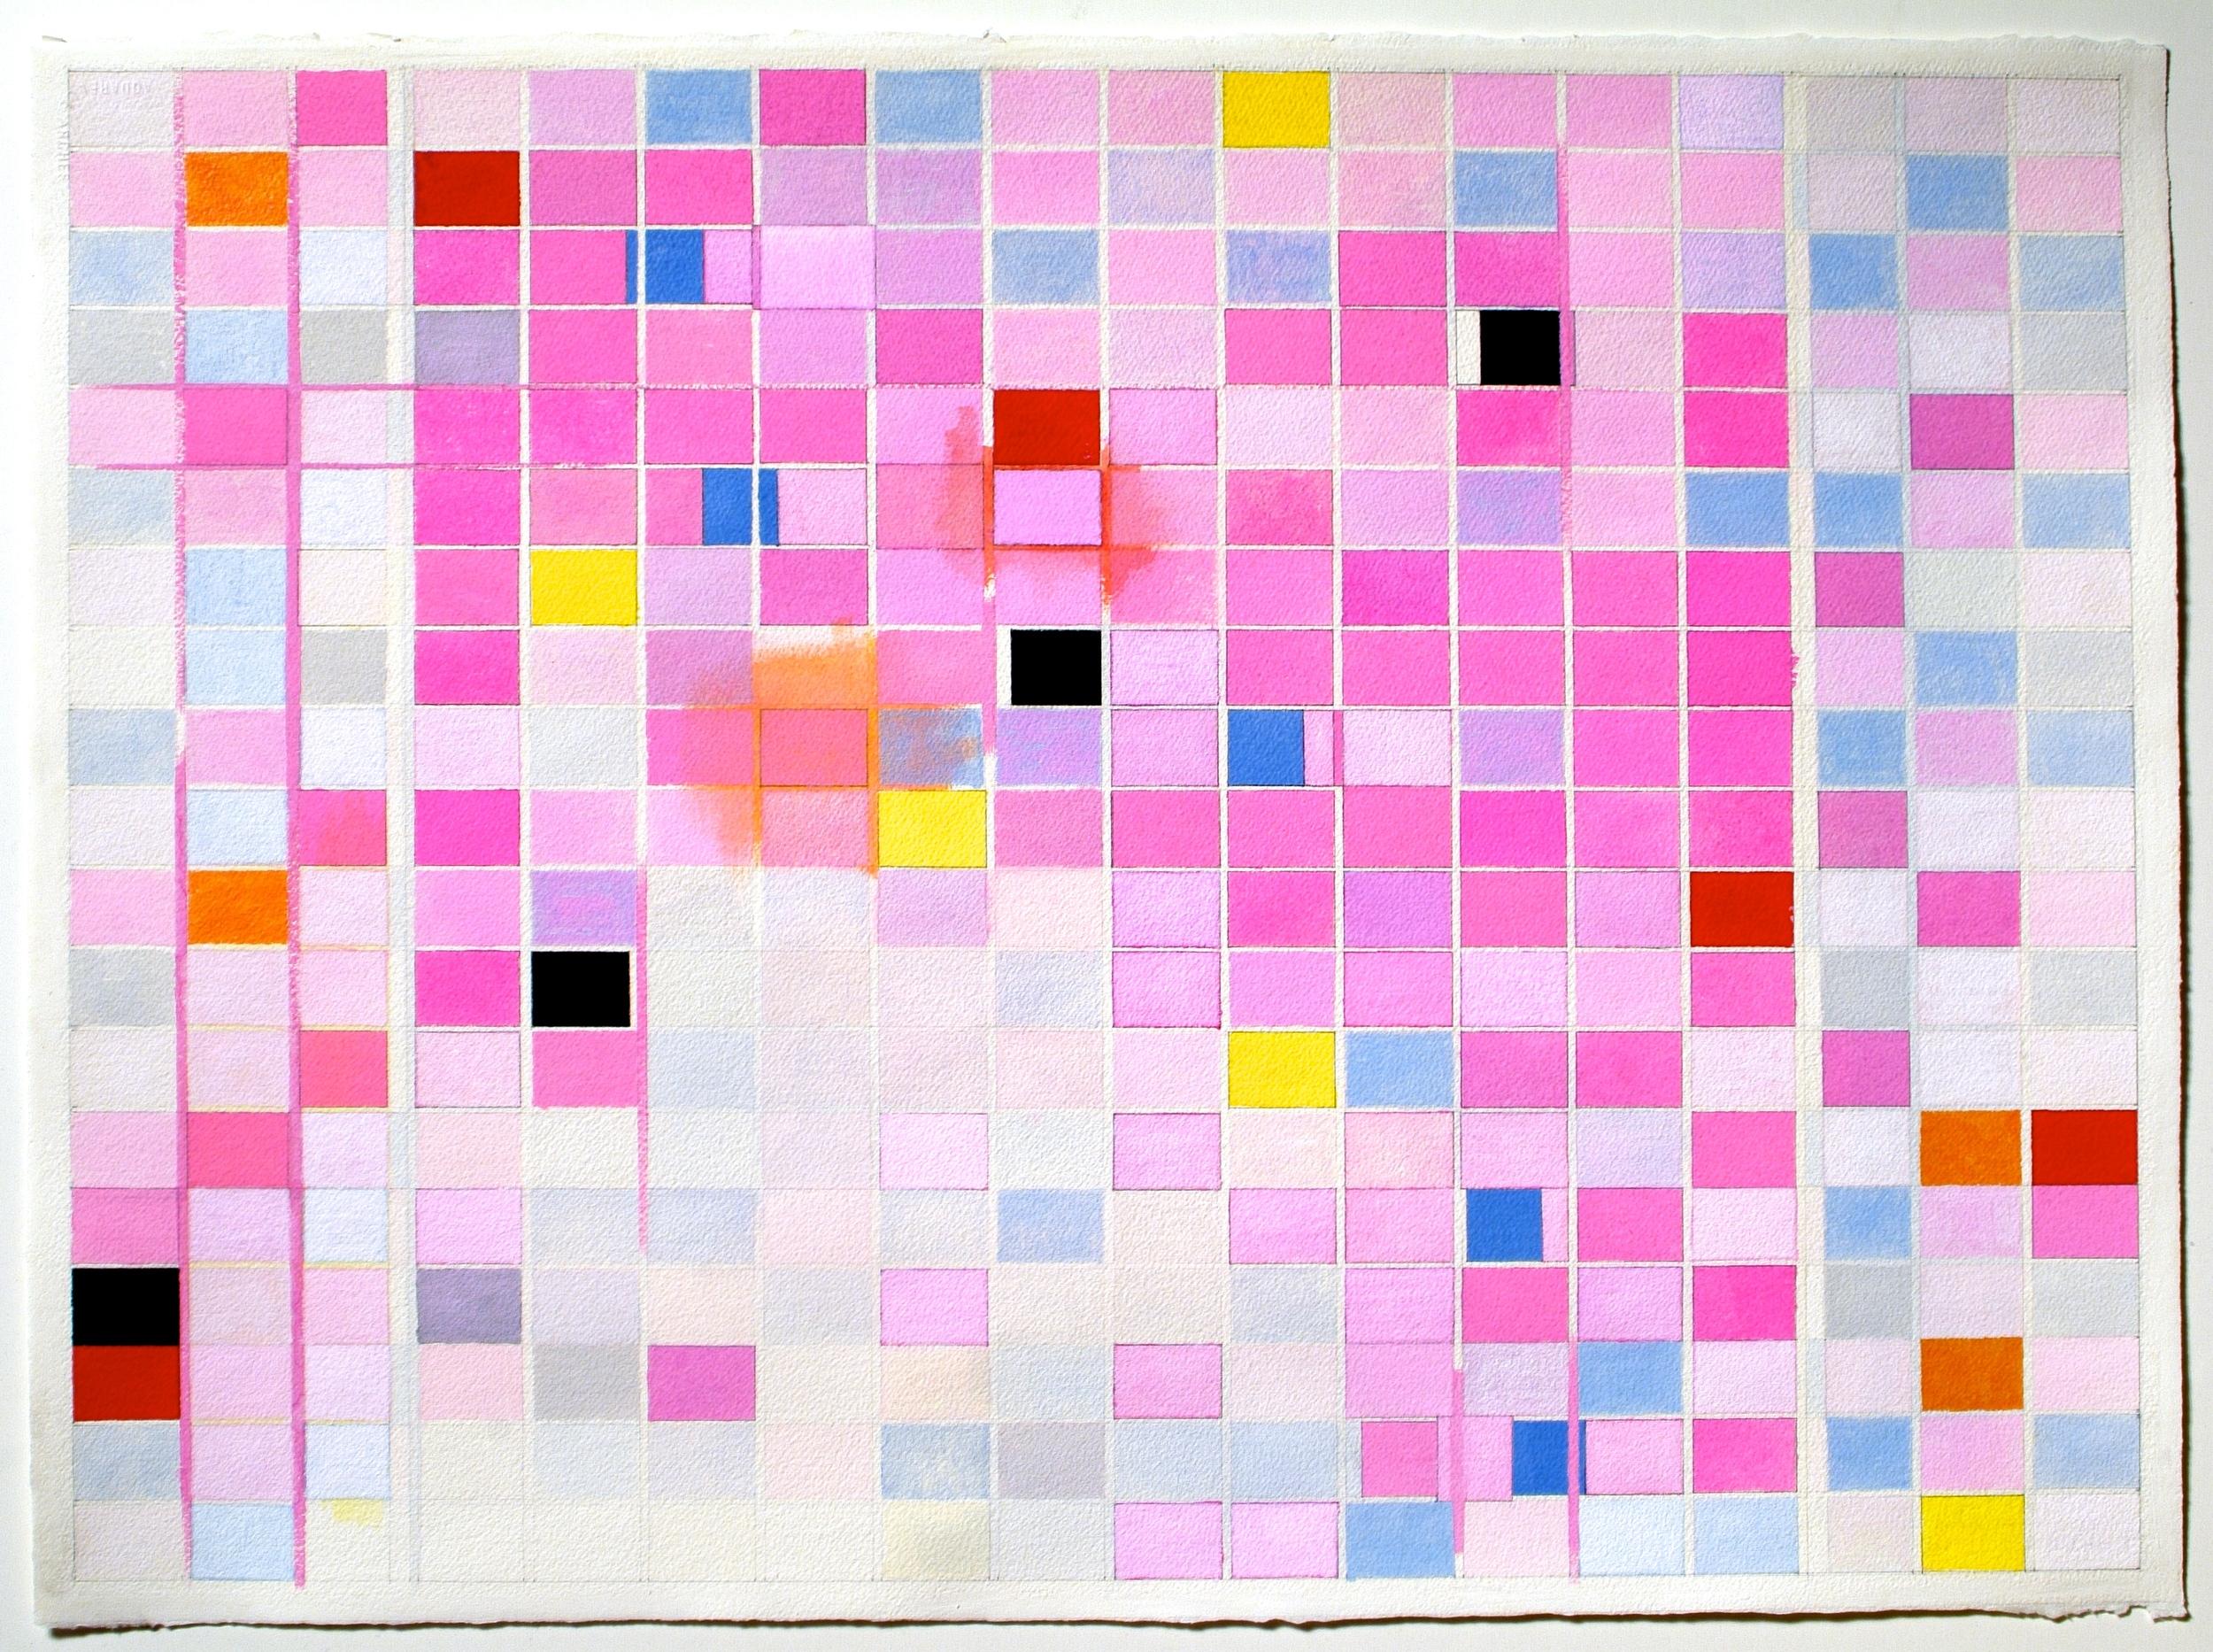 "Balanchine Mahler (PG37), 2004, gouache on paper, 21""x29"" (image), 22""x30"" (paper)"